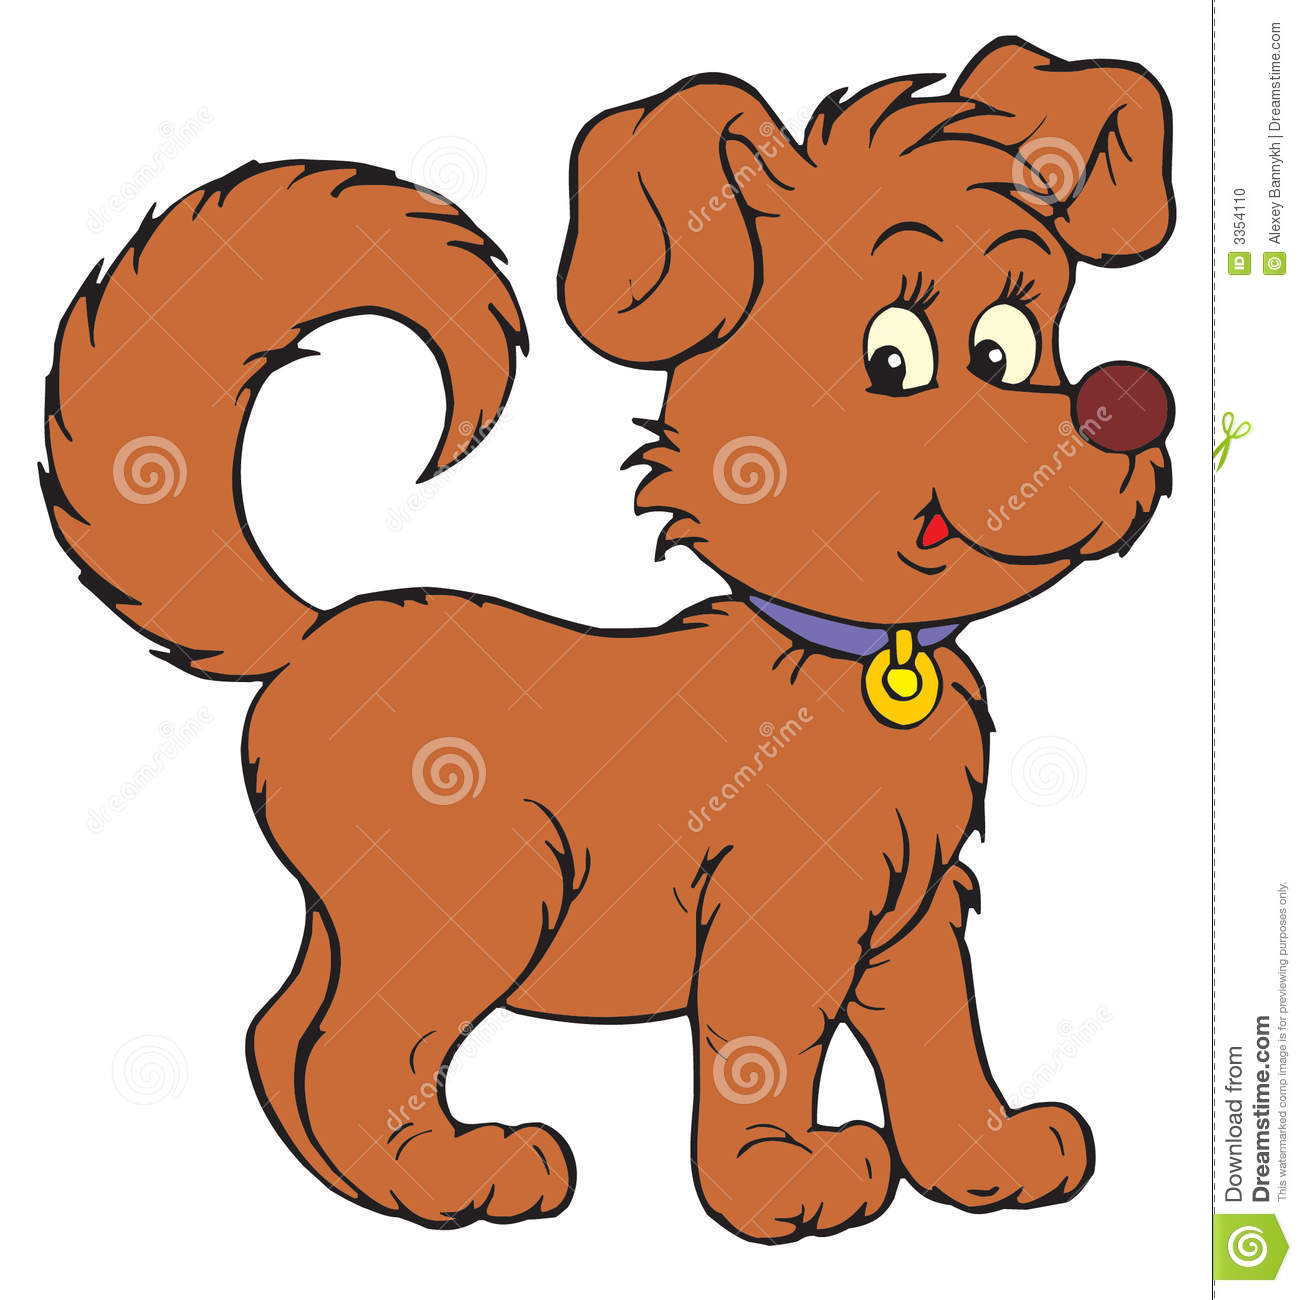 Clip Art Of Dogs - ClipartFest-Clip art of dogs - ClipartFest-3